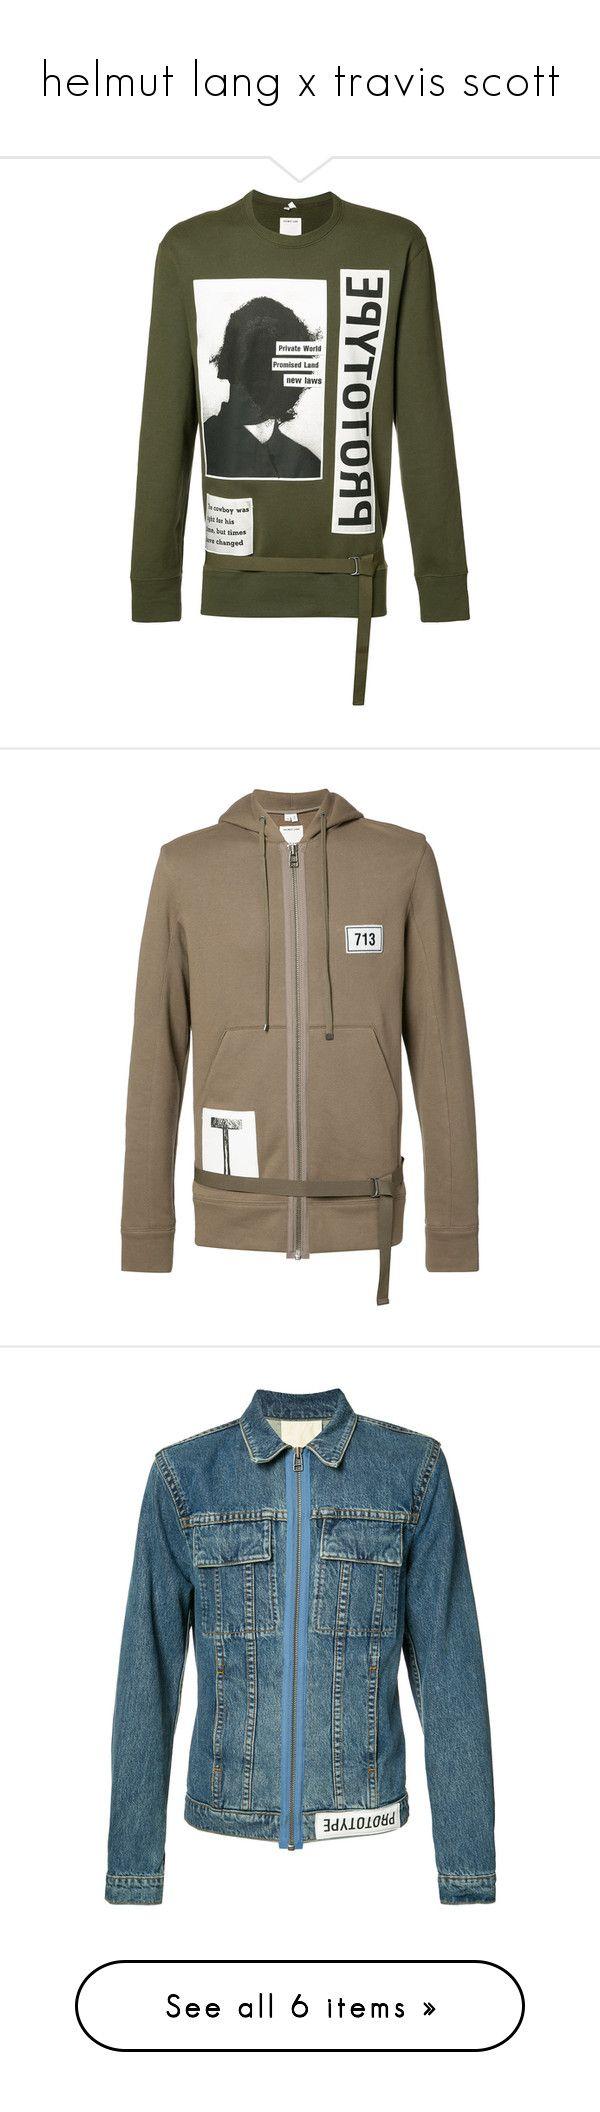 """helmut lang x travis scott"" by neua ❤ liked on Polyvore featuring men's fashion, men's clothing, men's hoodies, men's sweatshirts, green, helmut lang, brown, mens zip up hoodies, mens zipper hoodies and browning mens hoodies"